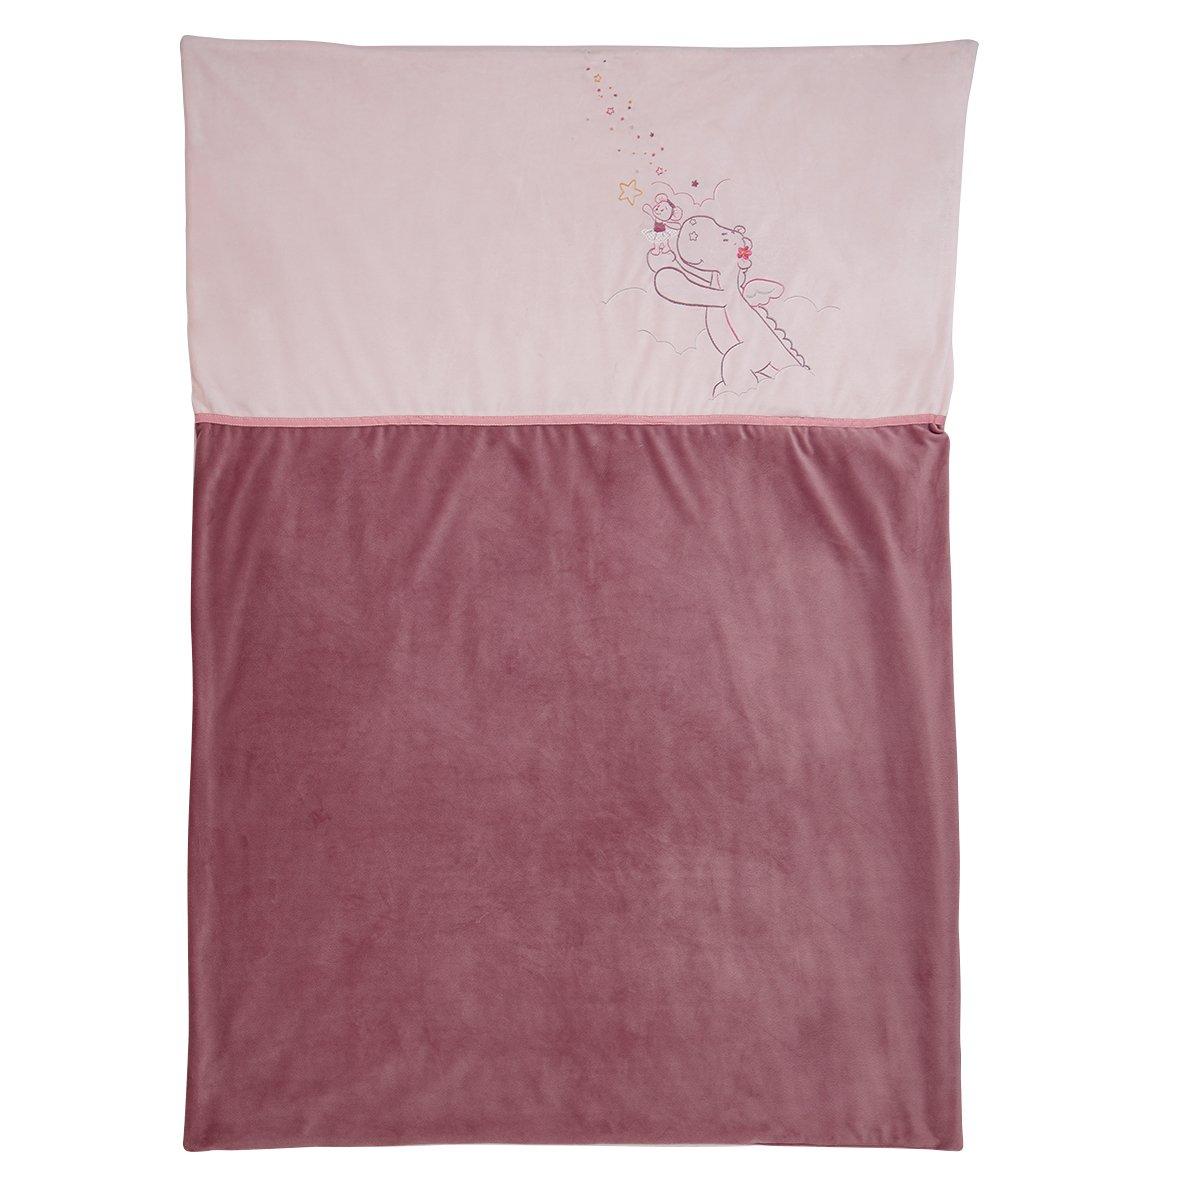 Noukies BB1620.09 M&V Veloudoux Decke, 100 x 140 cm, mehrfarbig